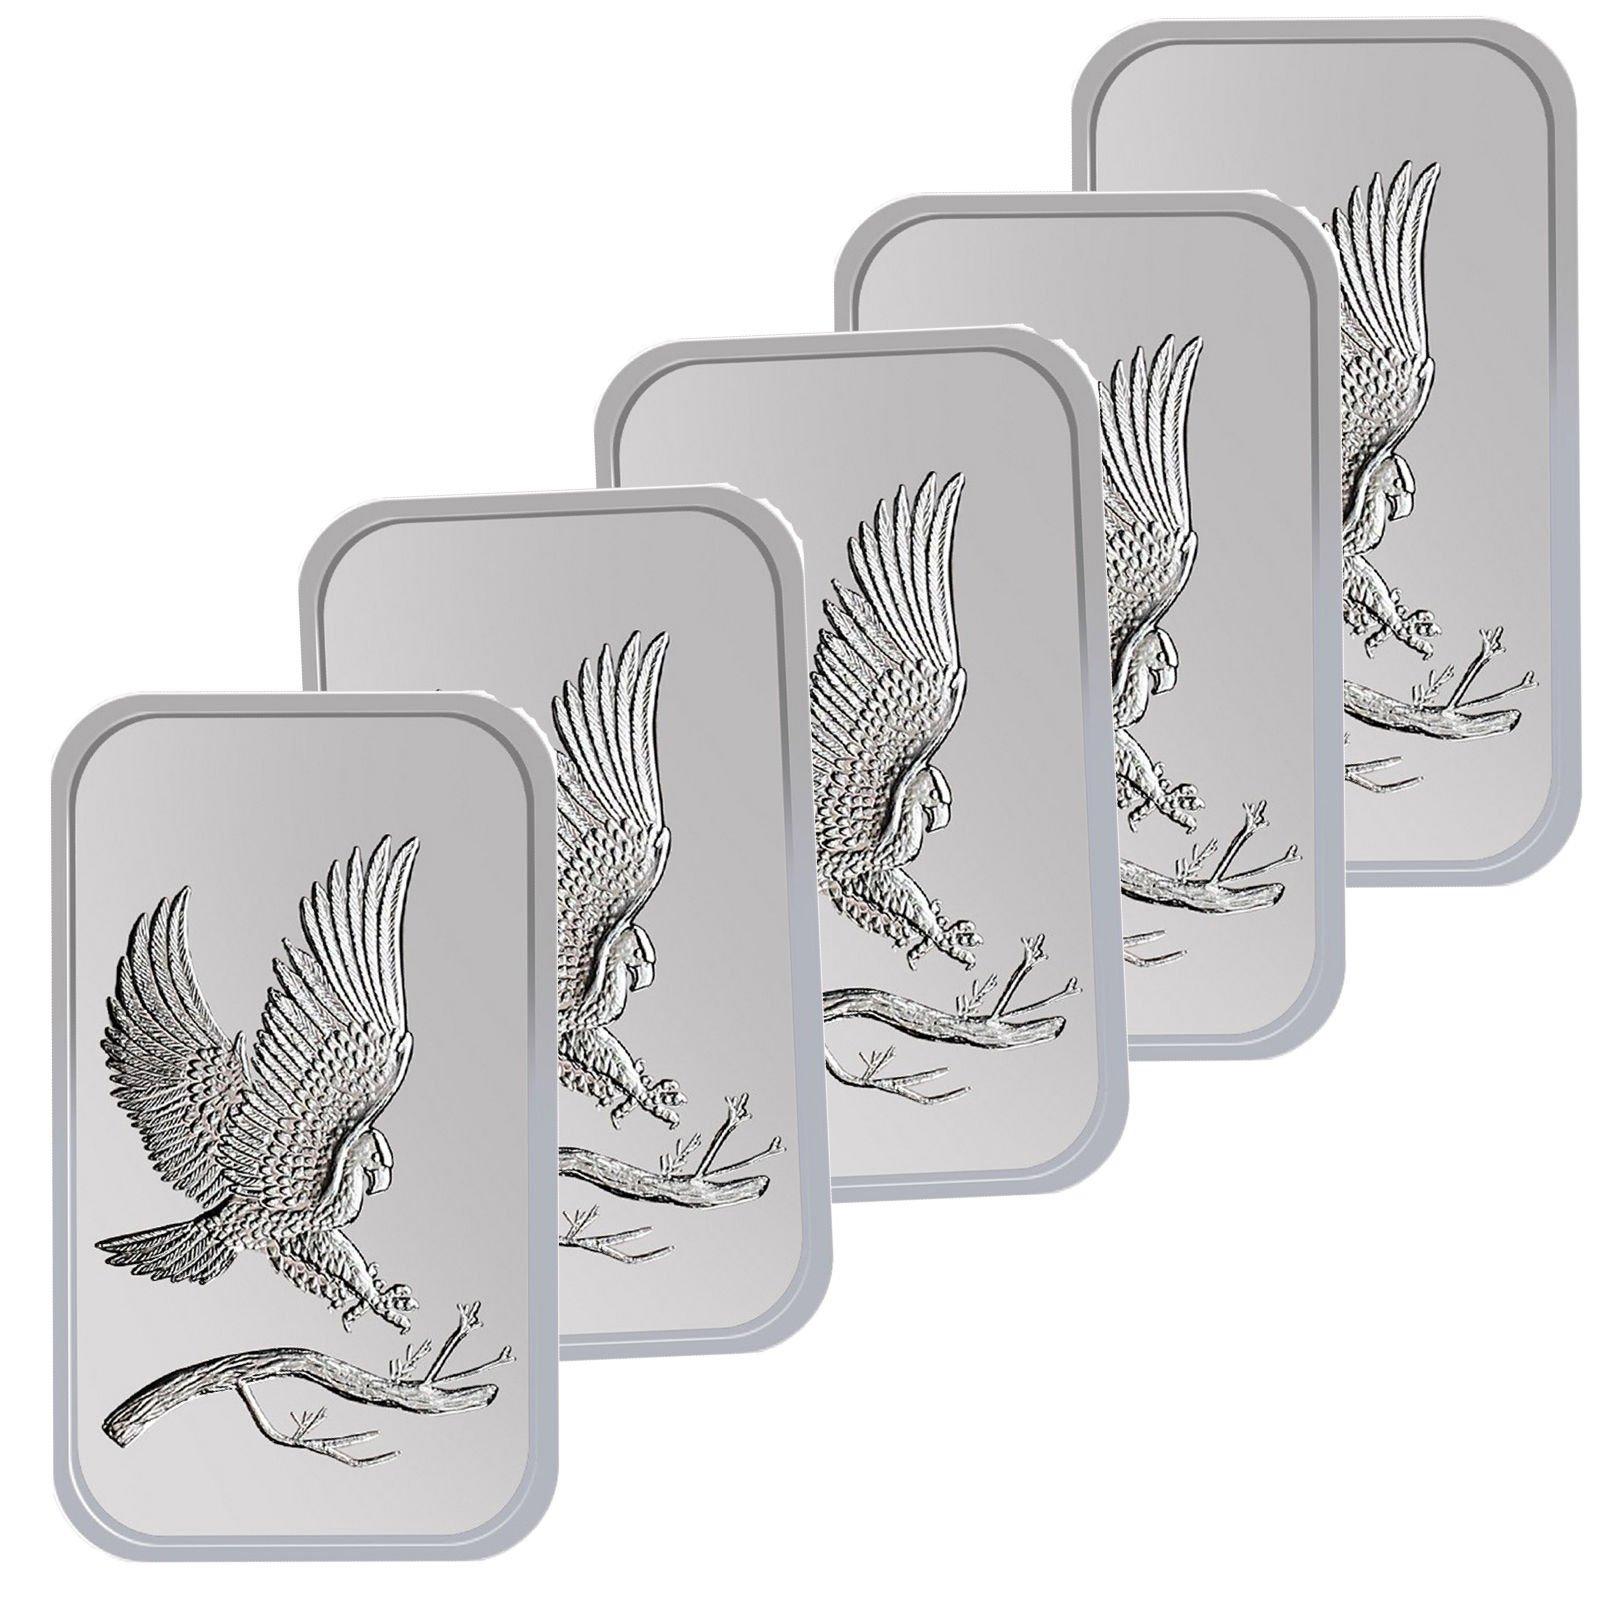 Trademark Bald Eagle 1oz .999 Fine Silver Bars by SilverTowne LOT OF 5